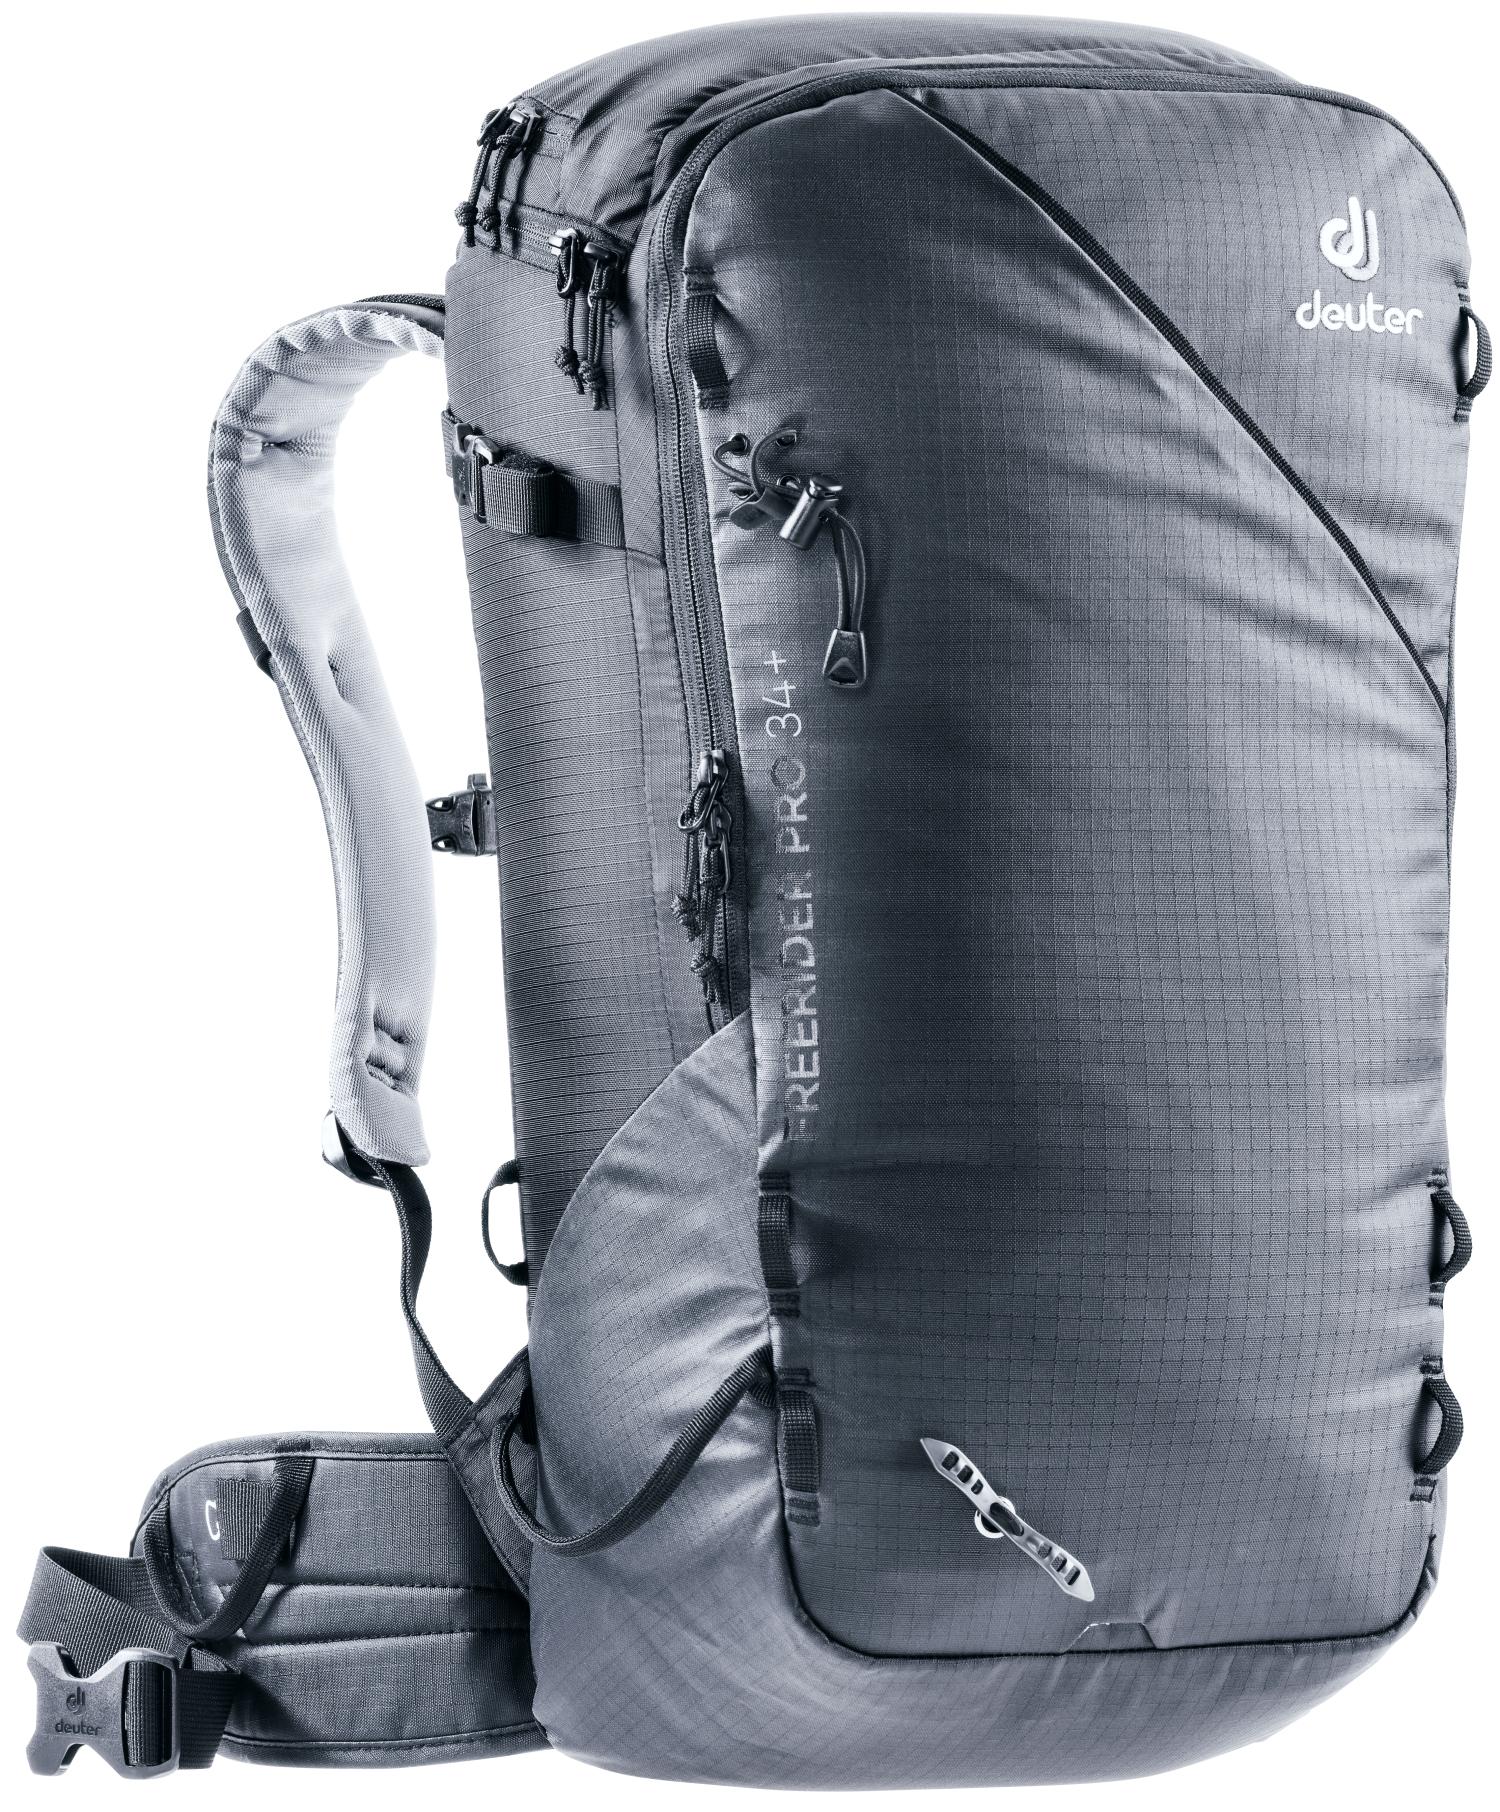 Рюкзаки для фрирайда Рюкзак сноубордический Deuter Freerider Pro 34+ 3303521-7000-FreeriderPro34plus-w20-d0.jpg